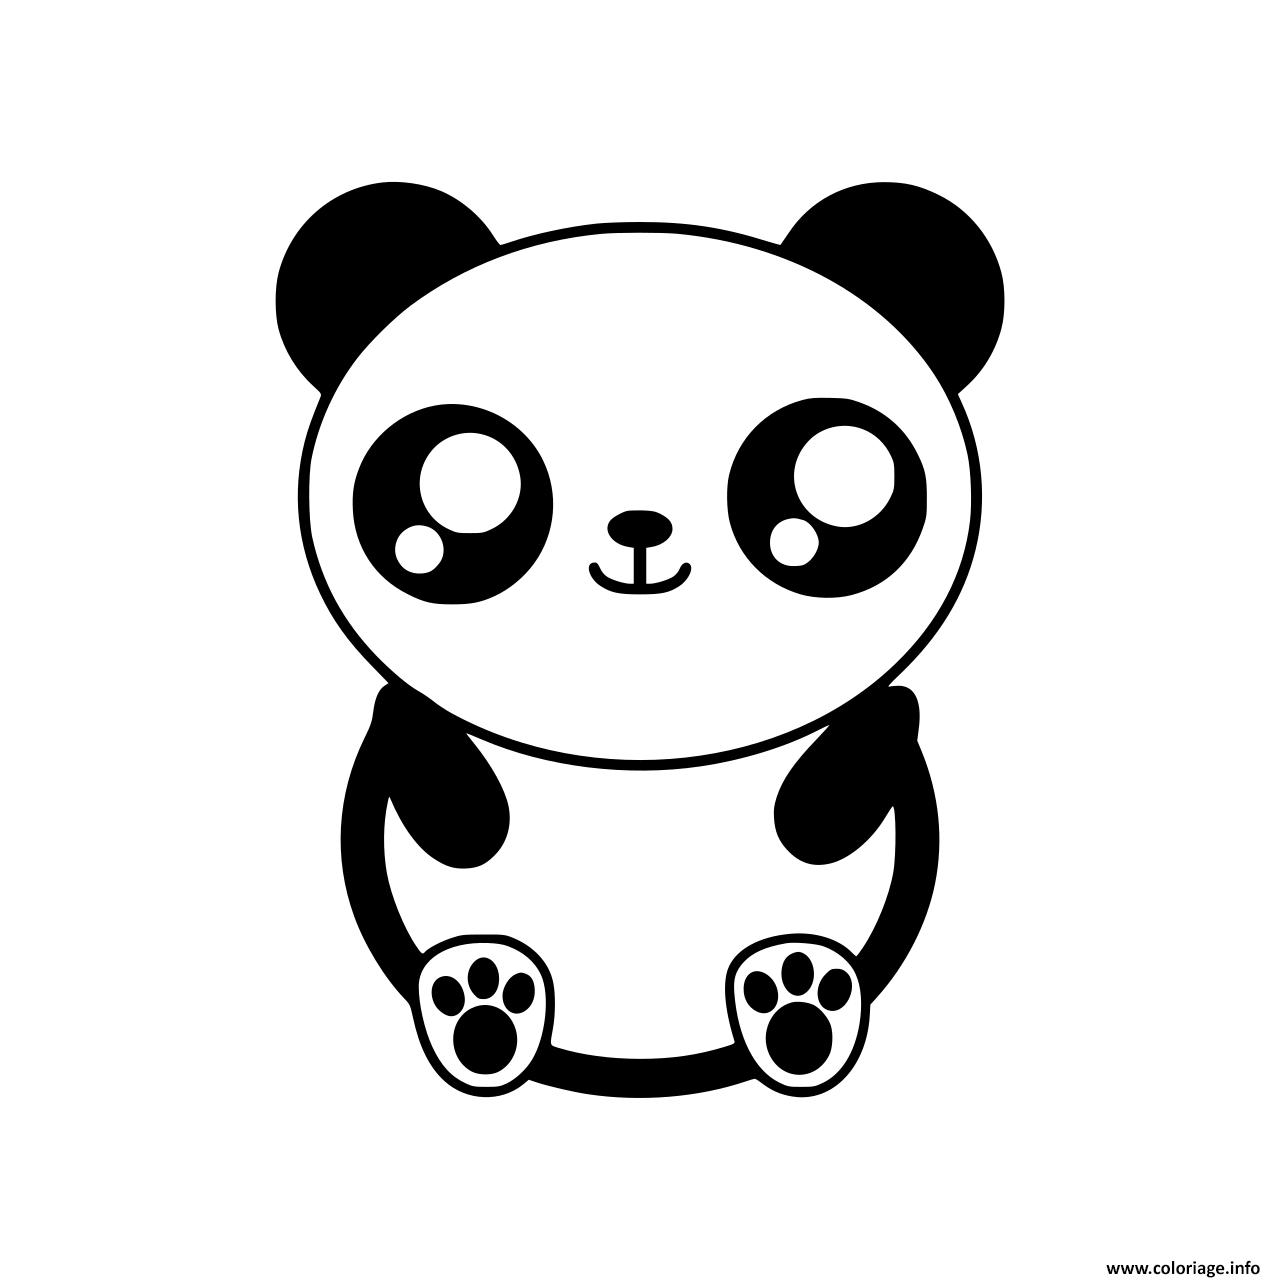 Coloriage Kawaii Panda Dessin A Imprimer